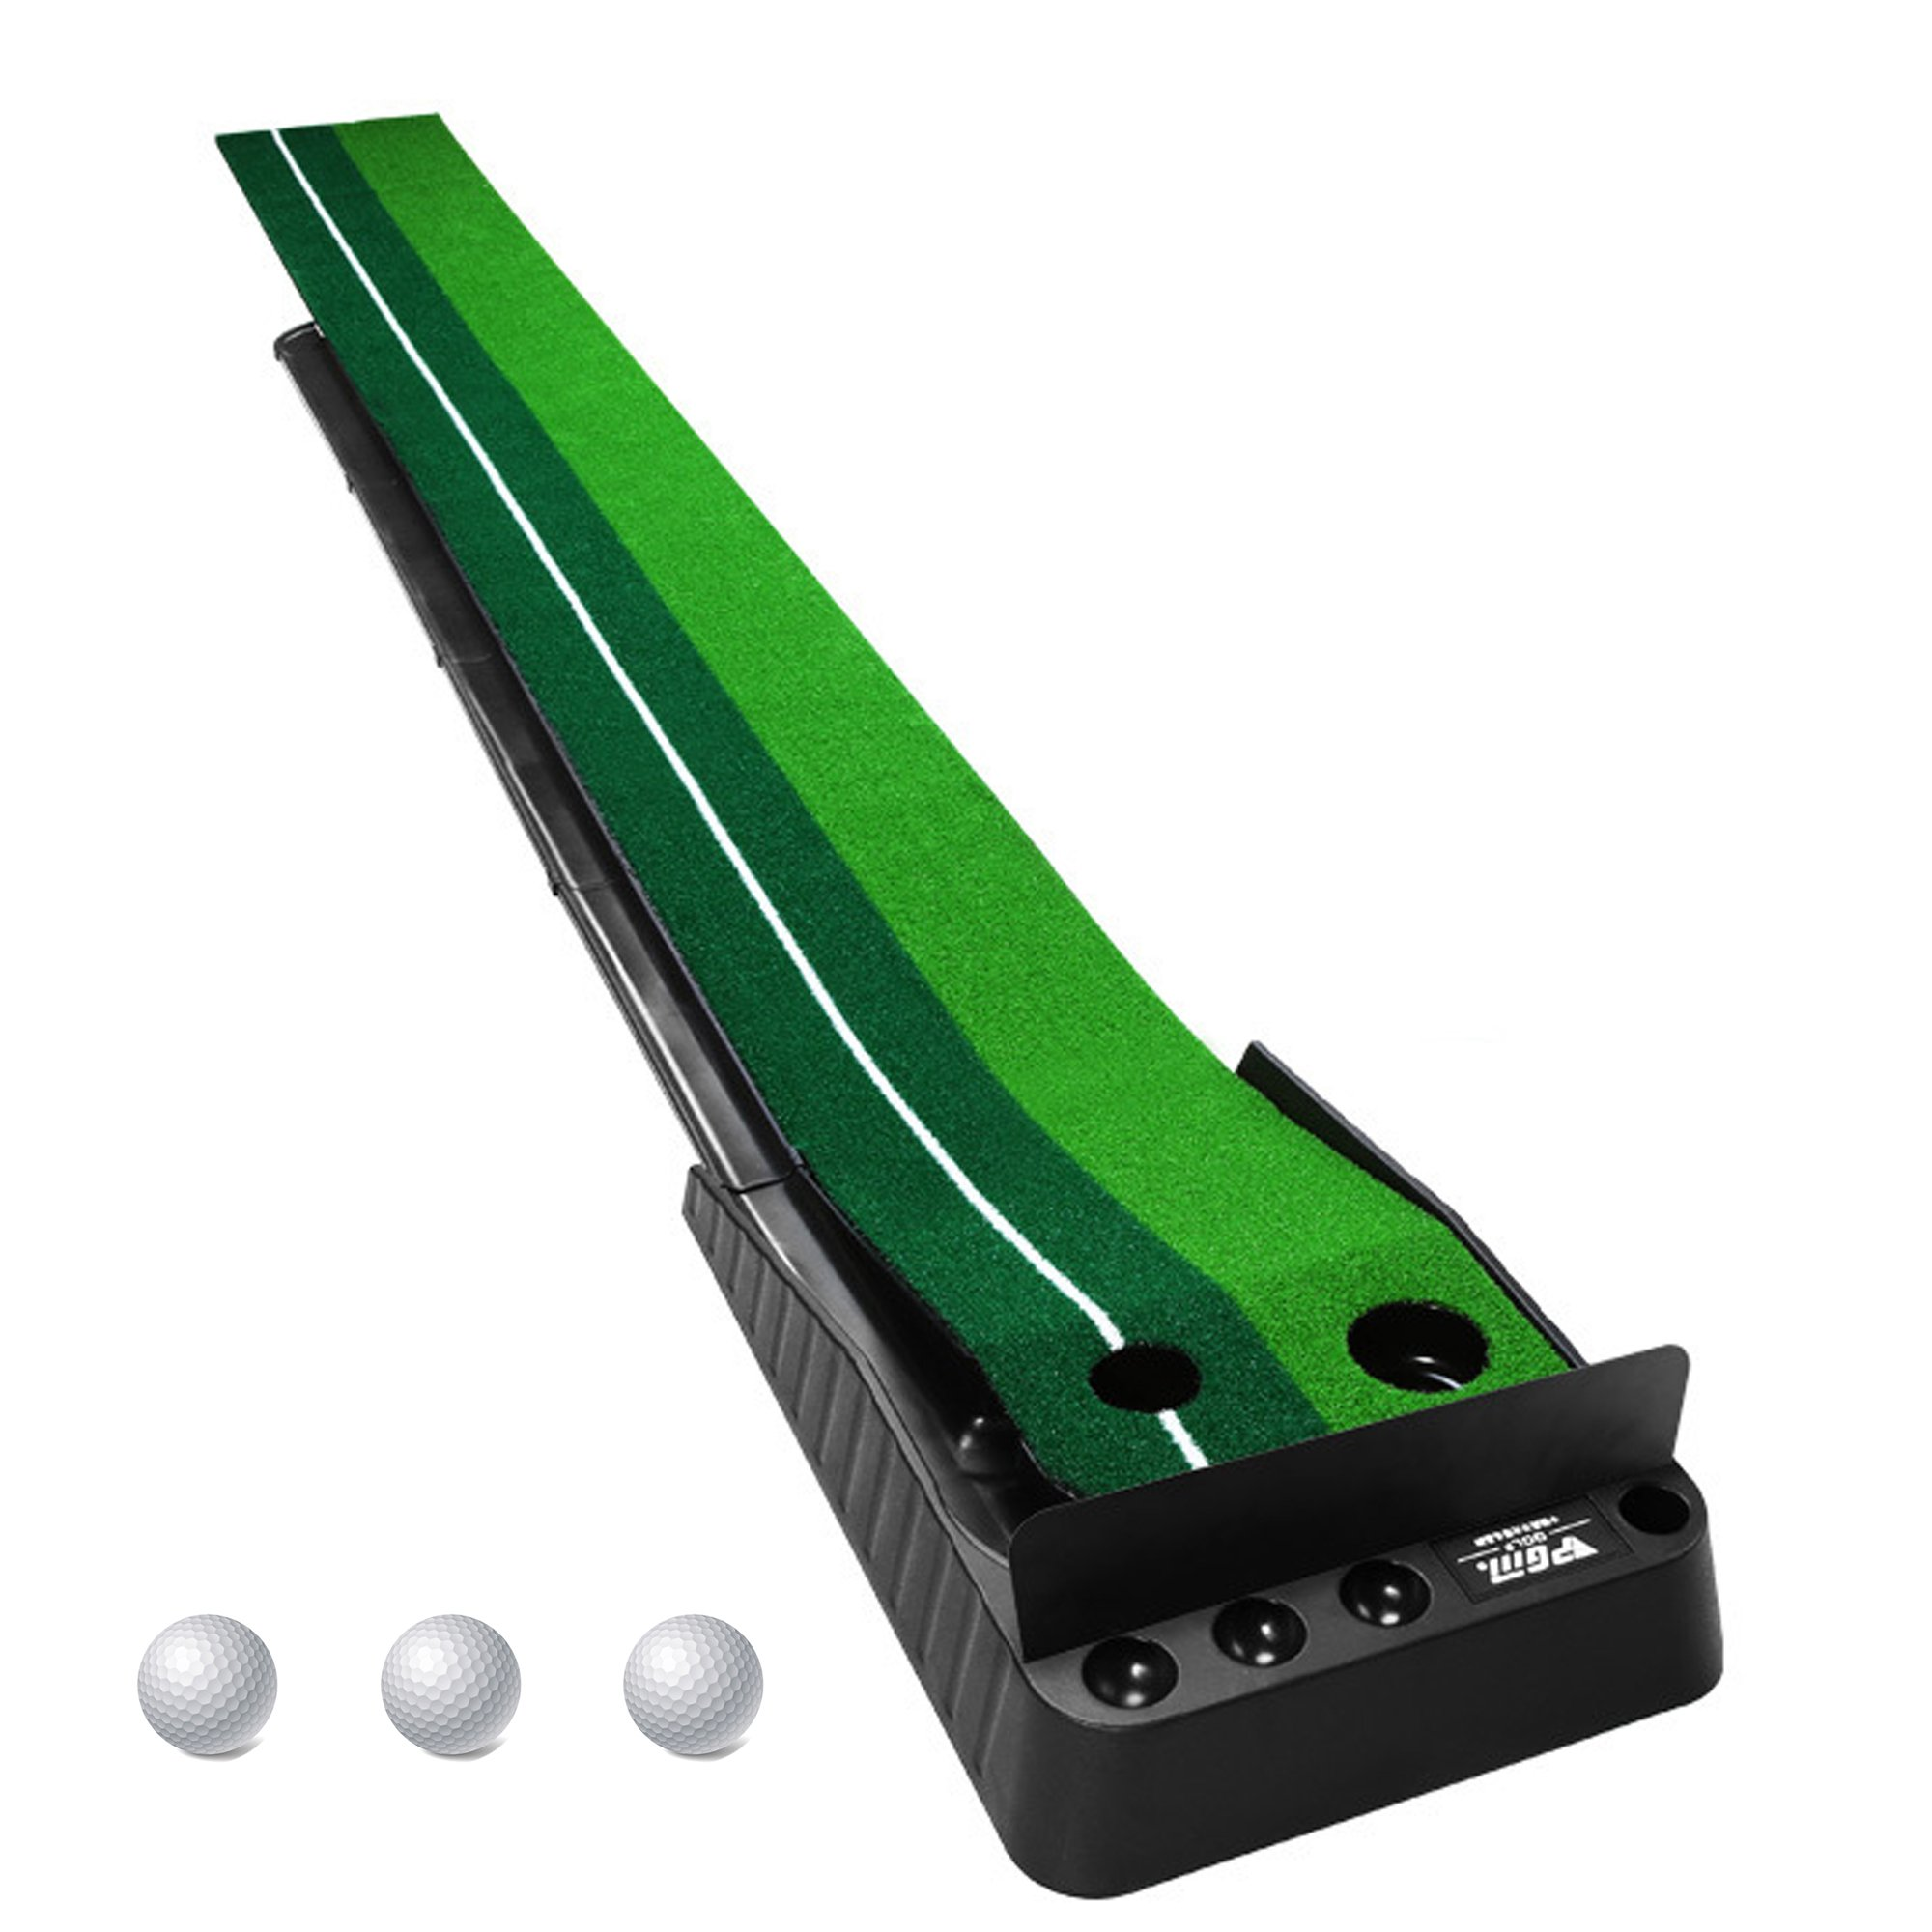 Golf Putting Training Auto Return Mat with 3 Training  Balls